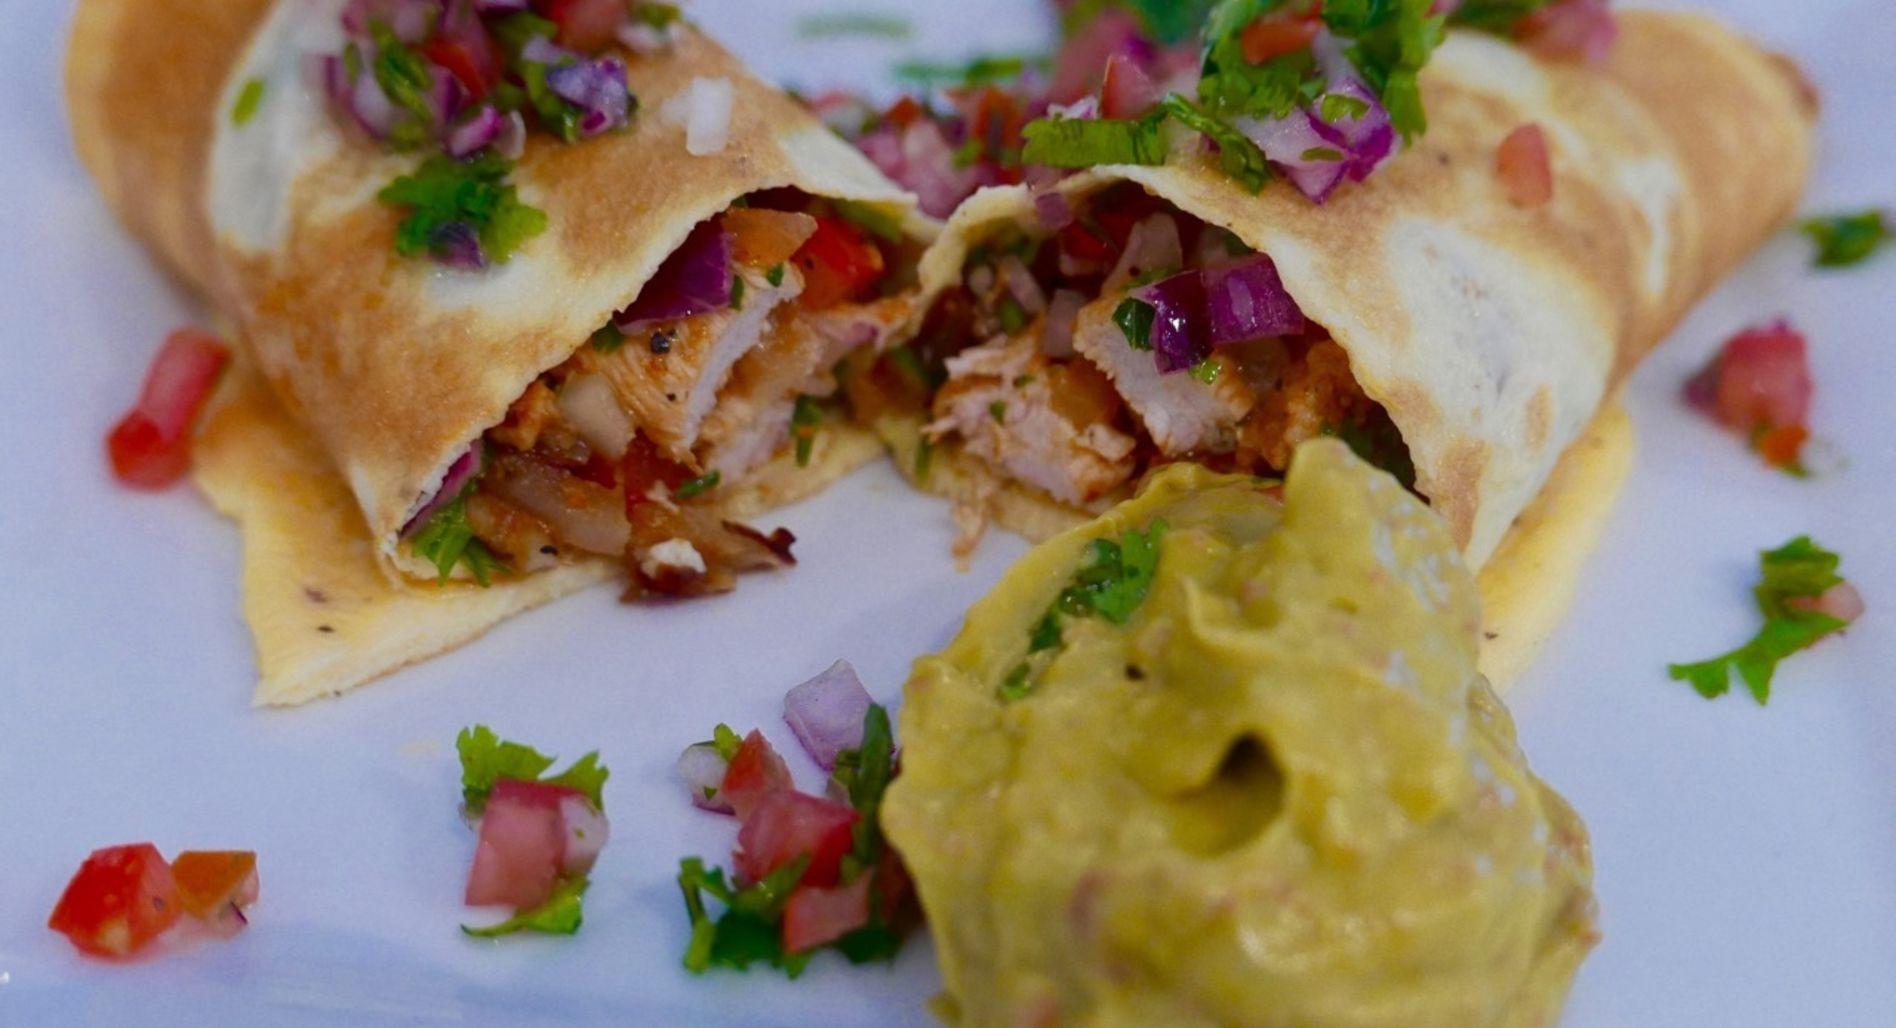 Egg Wrap Chicken Fajitas With Fresh Guacamole & Salsa